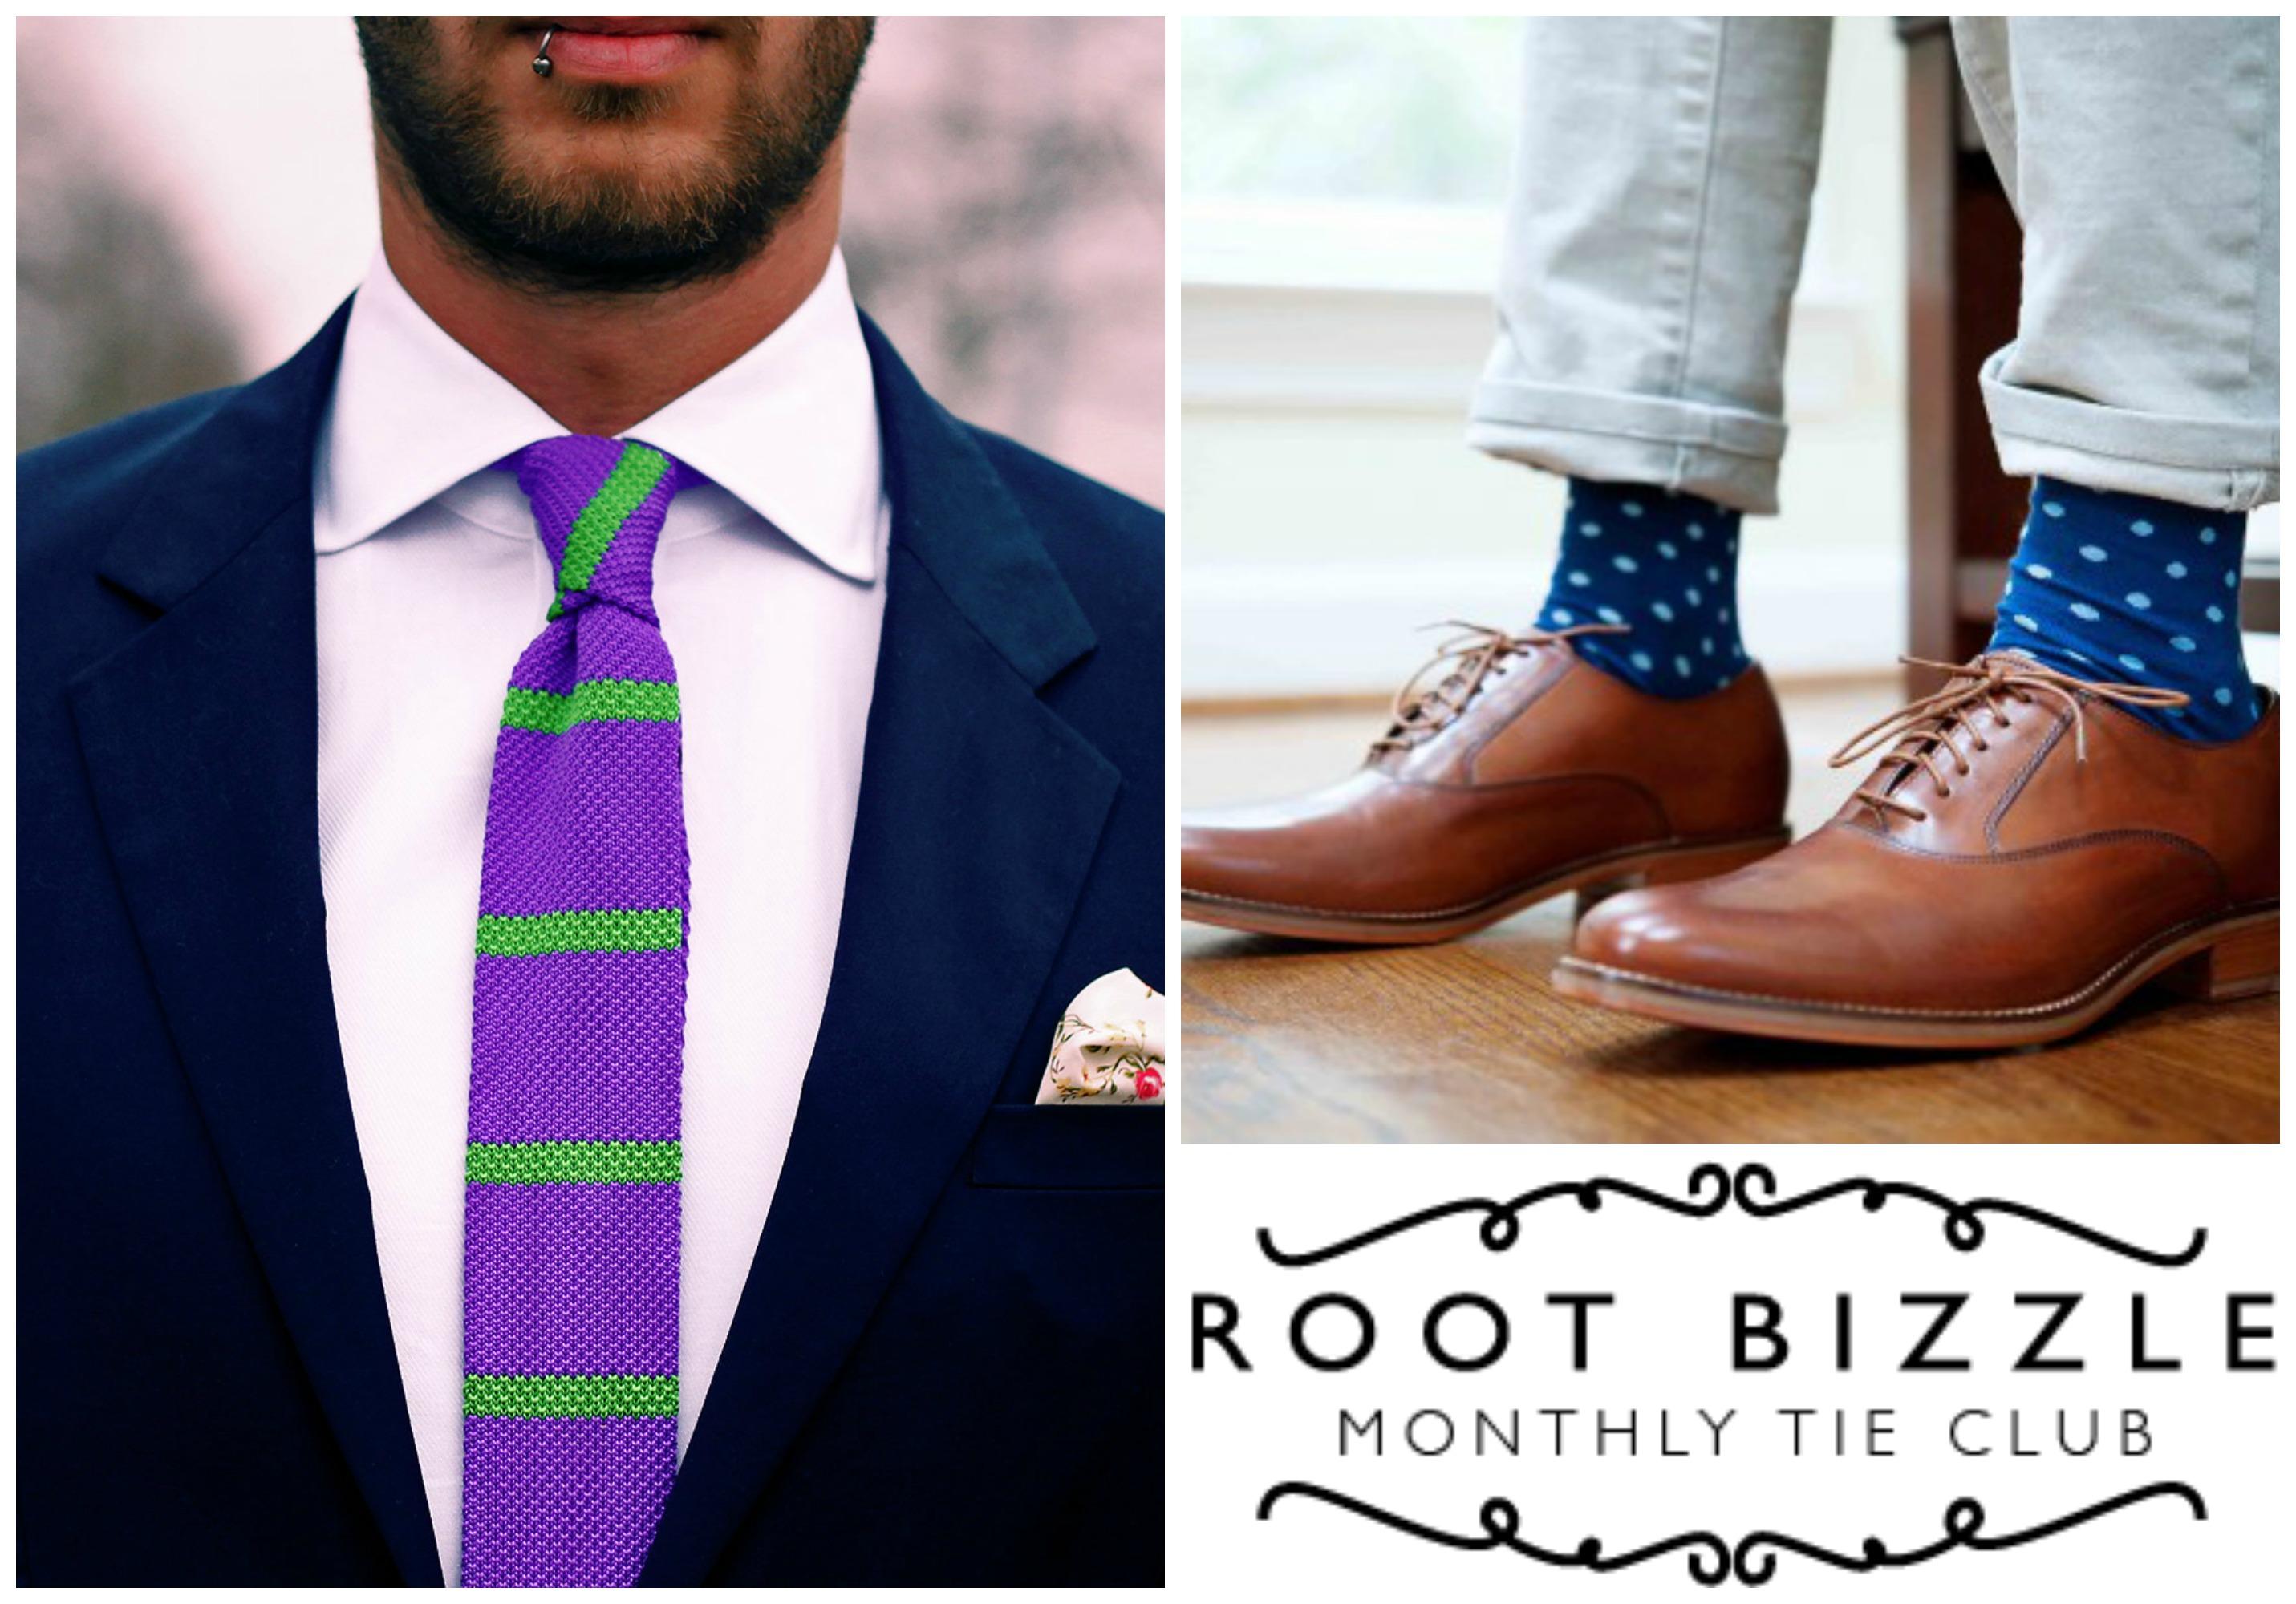 rootbizzle tie club